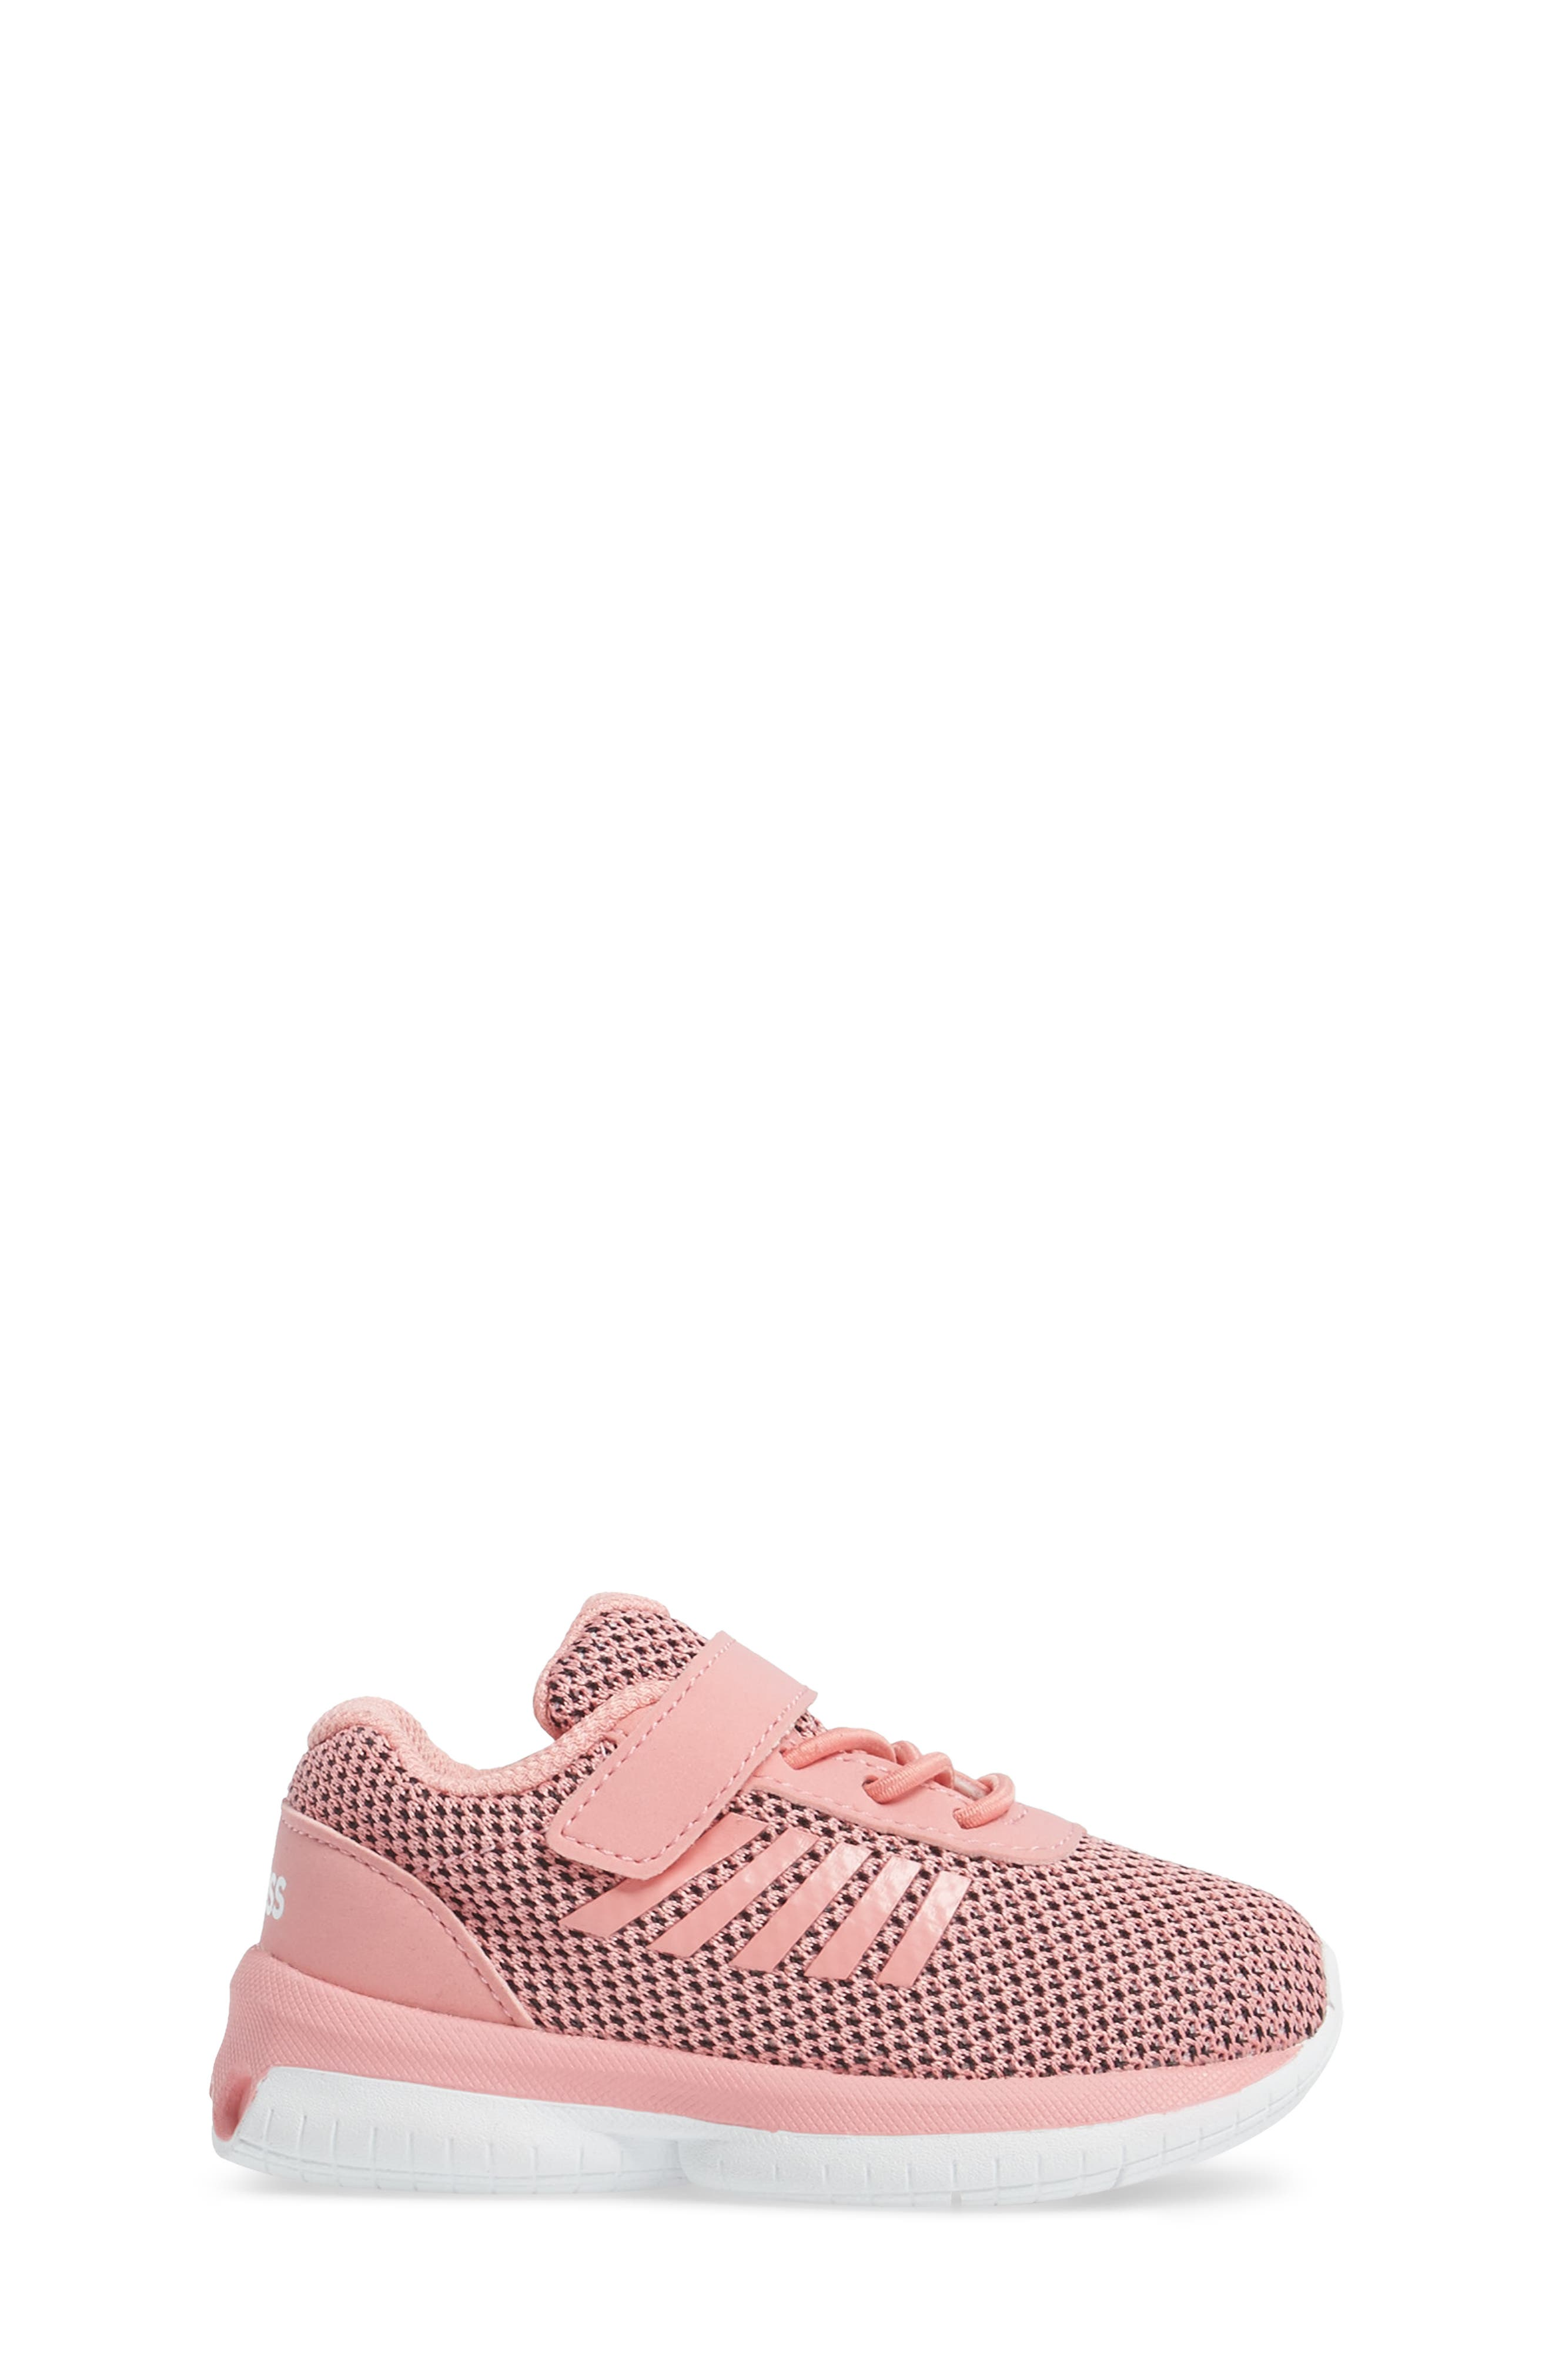 Tubes Infinity Sneaker,                             Alternate thumbnail 3, color,                             Flamingo Pink/ White